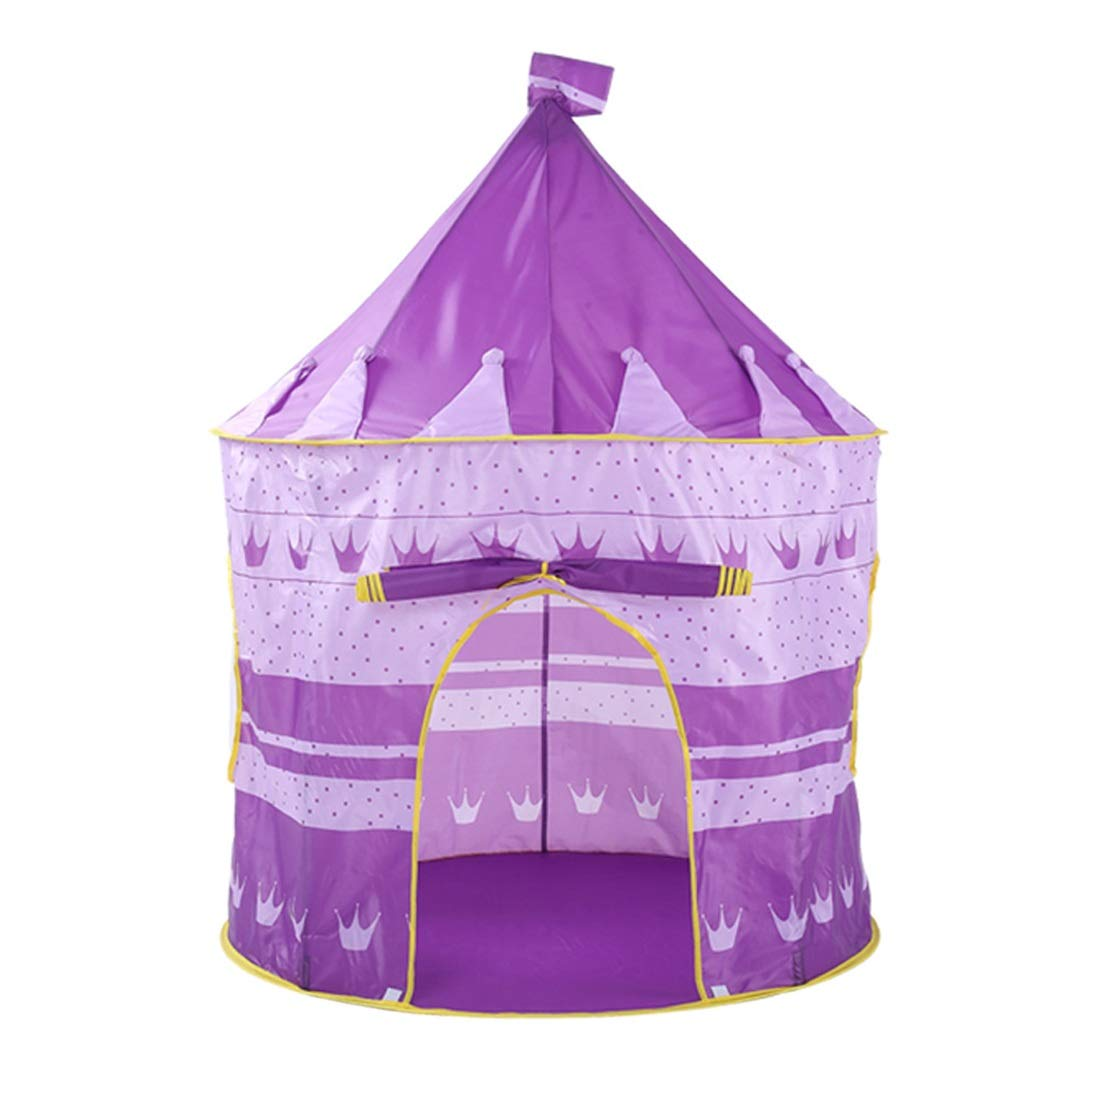 Nekovan クリエイティブクラウン演劇テントキッズ子供屋内の折り畳み式玩具プレイハウスパープル (色 : B07R5FMJCD Purple) Purple : Purple B07R5FMJCD, ベクトル 新都リユース:8cd2e384 --- number-directory.top